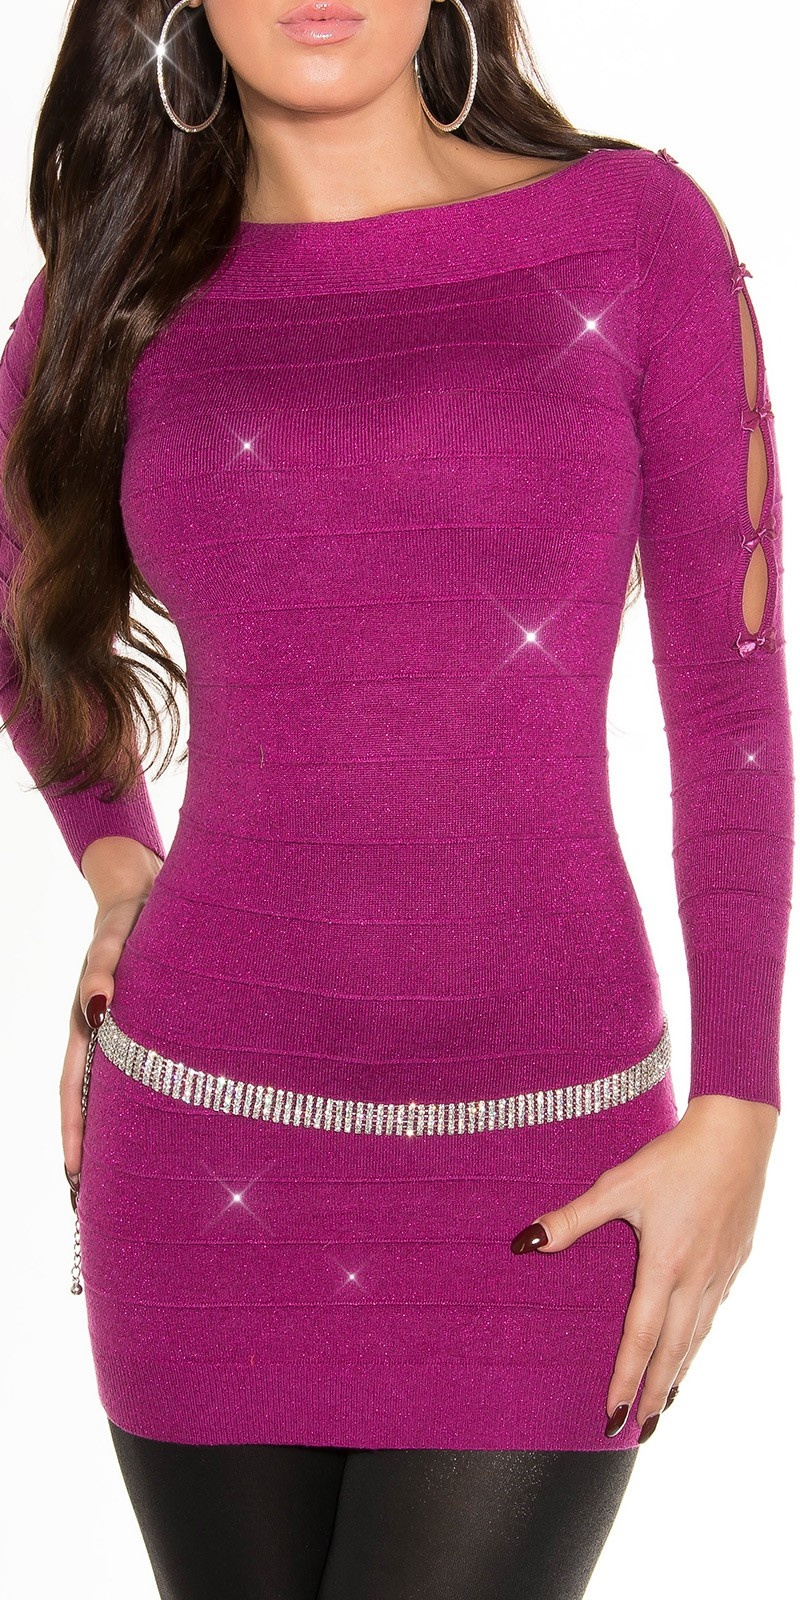 Fijn-Gebreide-Mini-Jurk met glitter-effect Violet